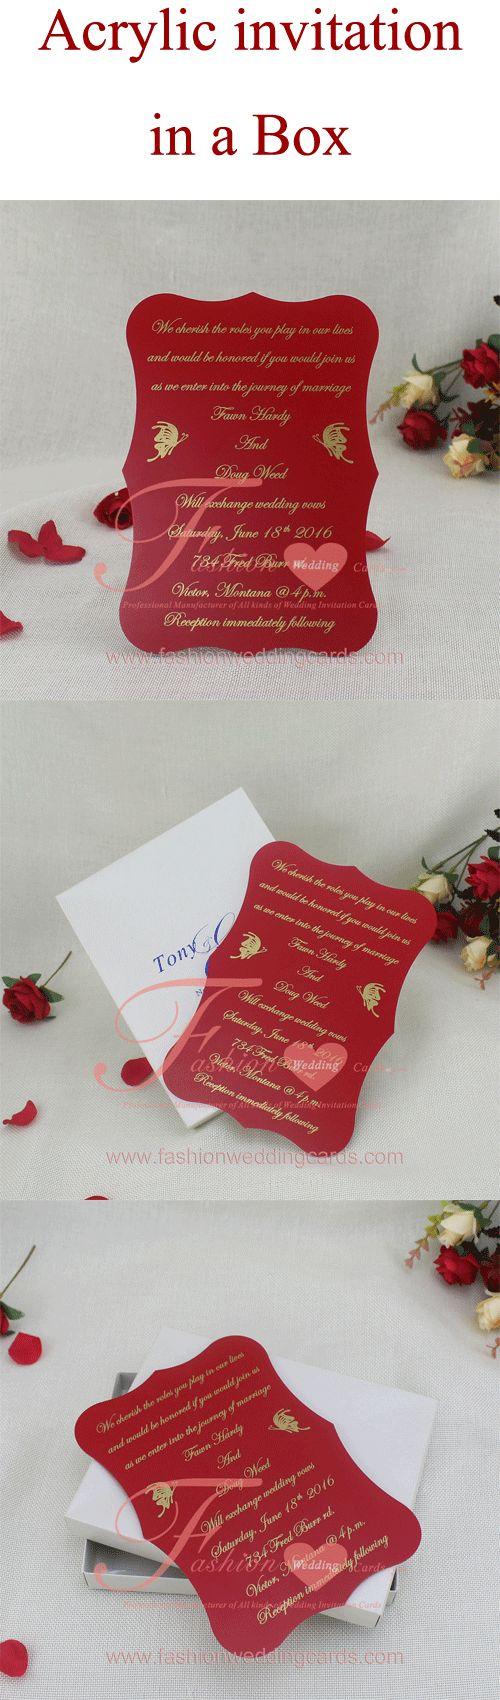 The 8 best Acrylic Wedding Invitations Ideas images on Pinterest ...